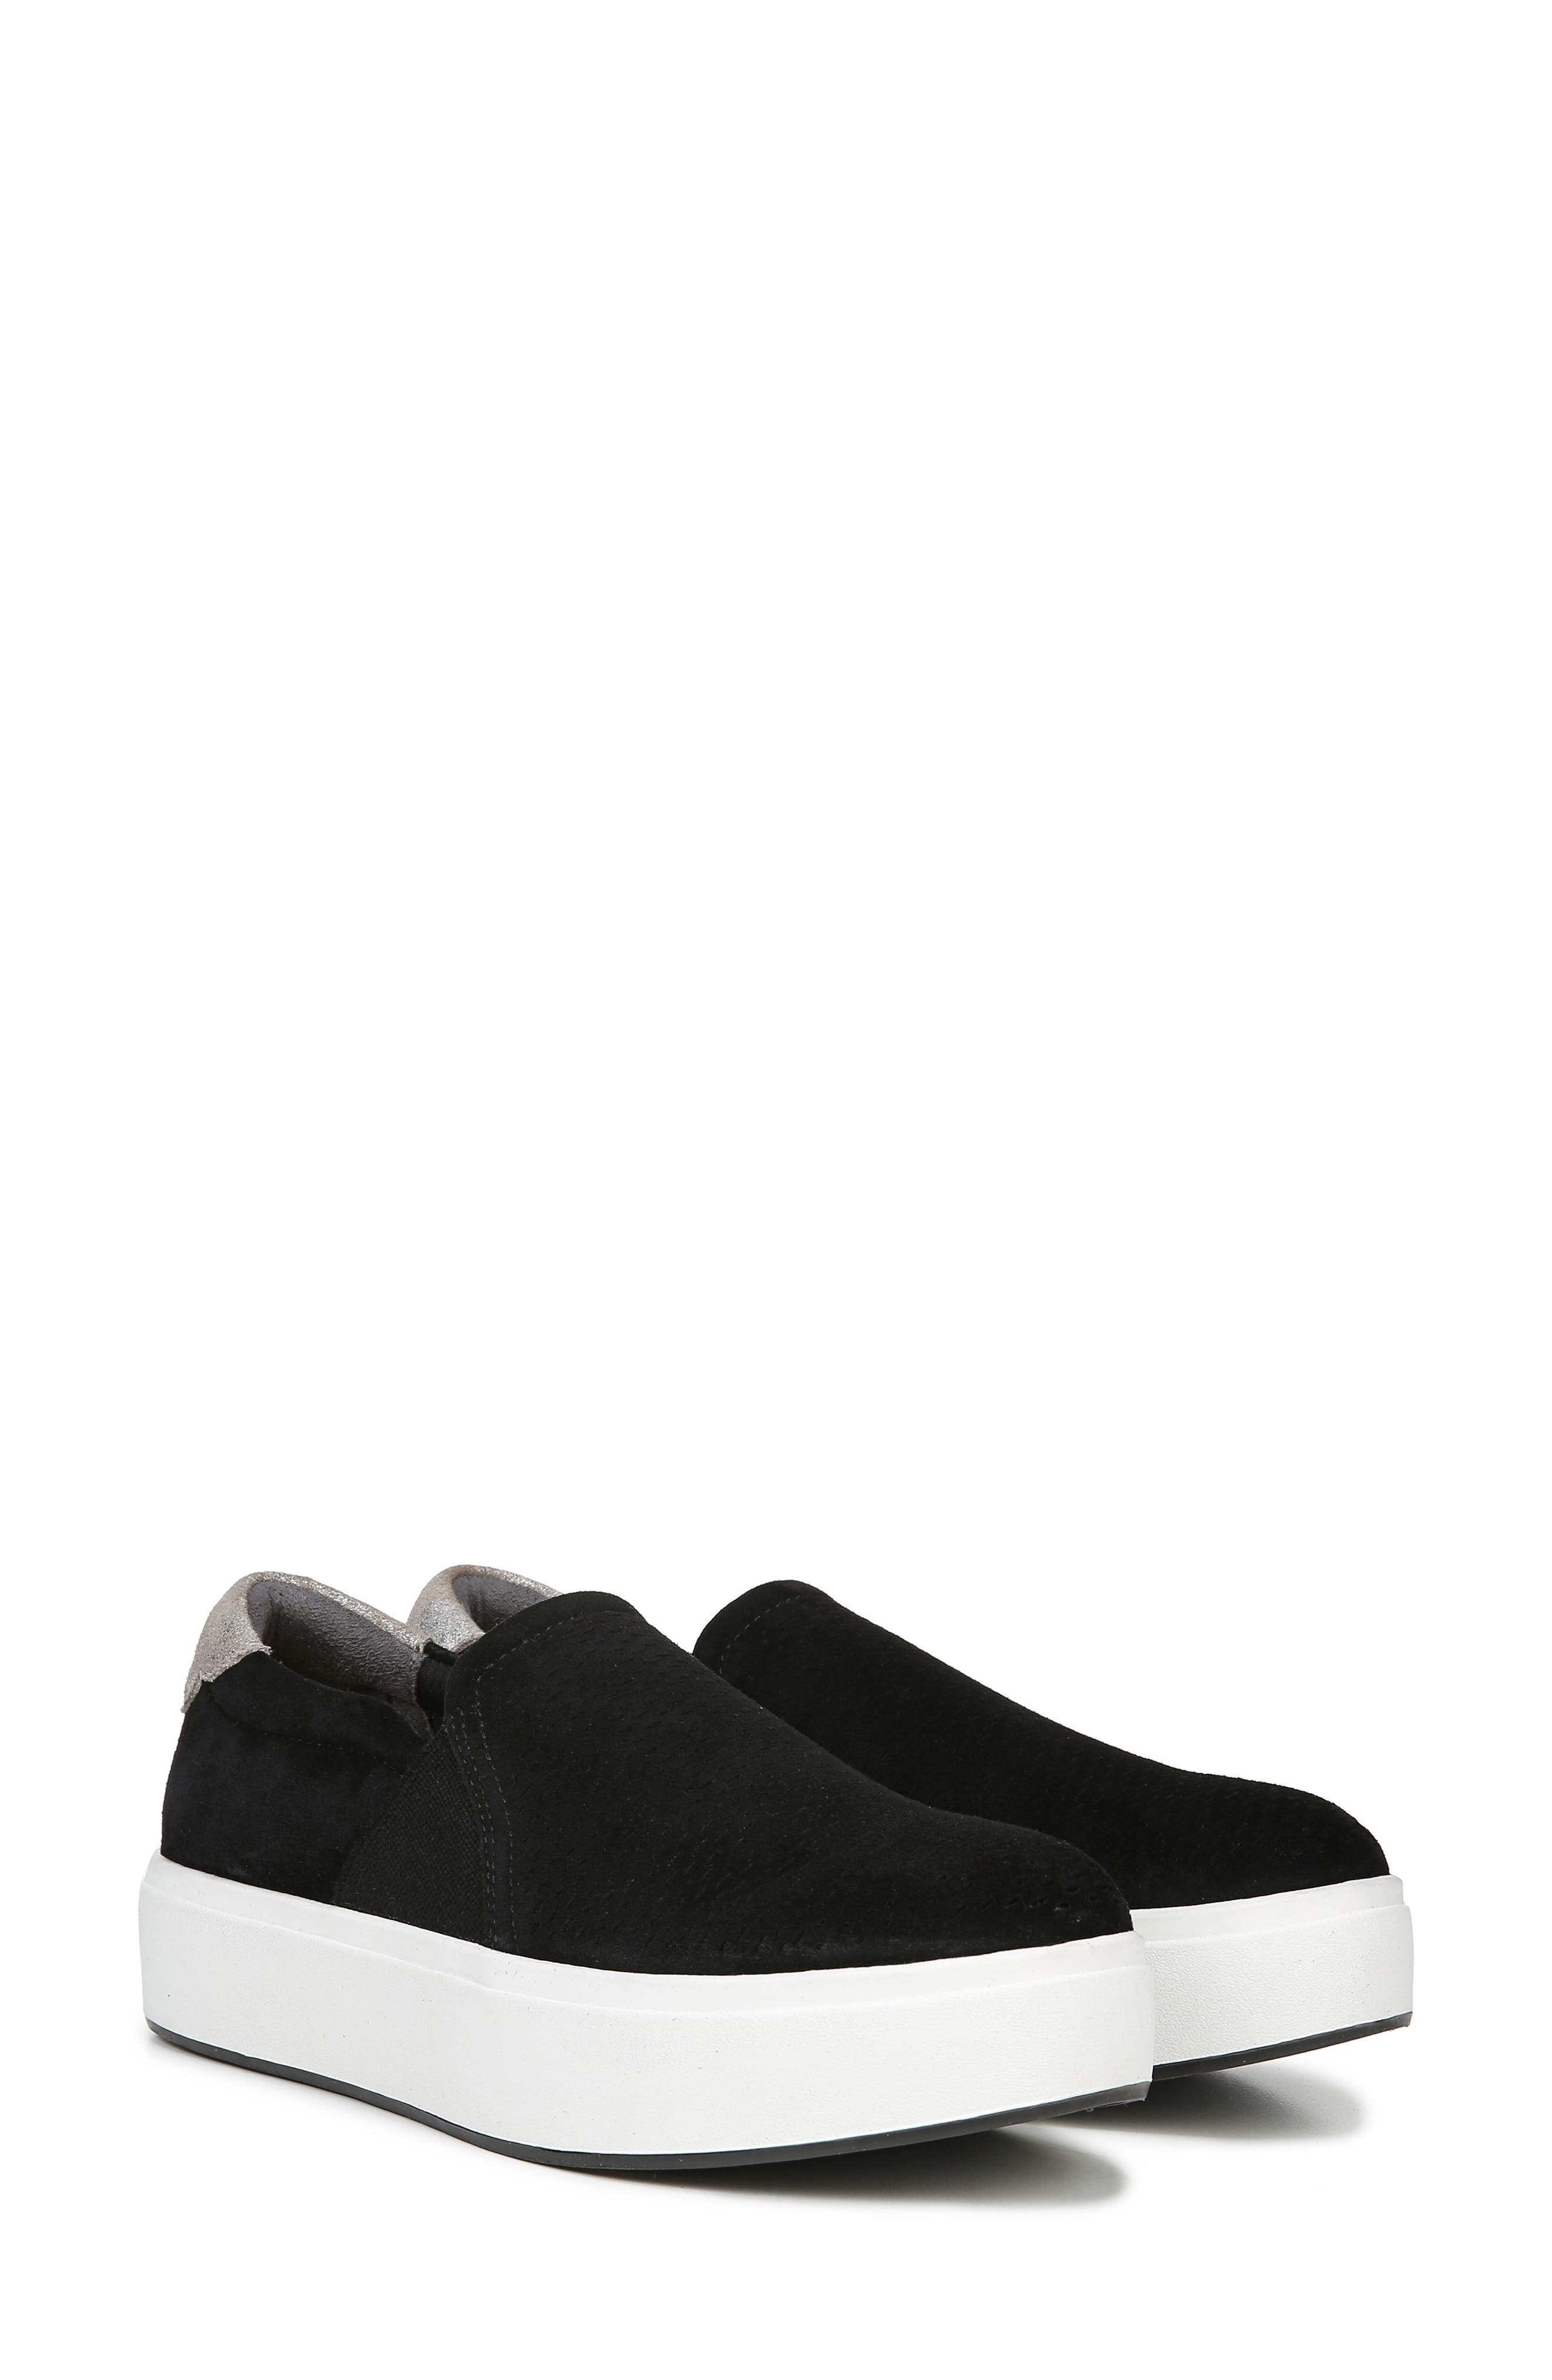 Abbot Lux Sneaker,                             Alternate thumbnail 9, color,                             BLACK SUEDE